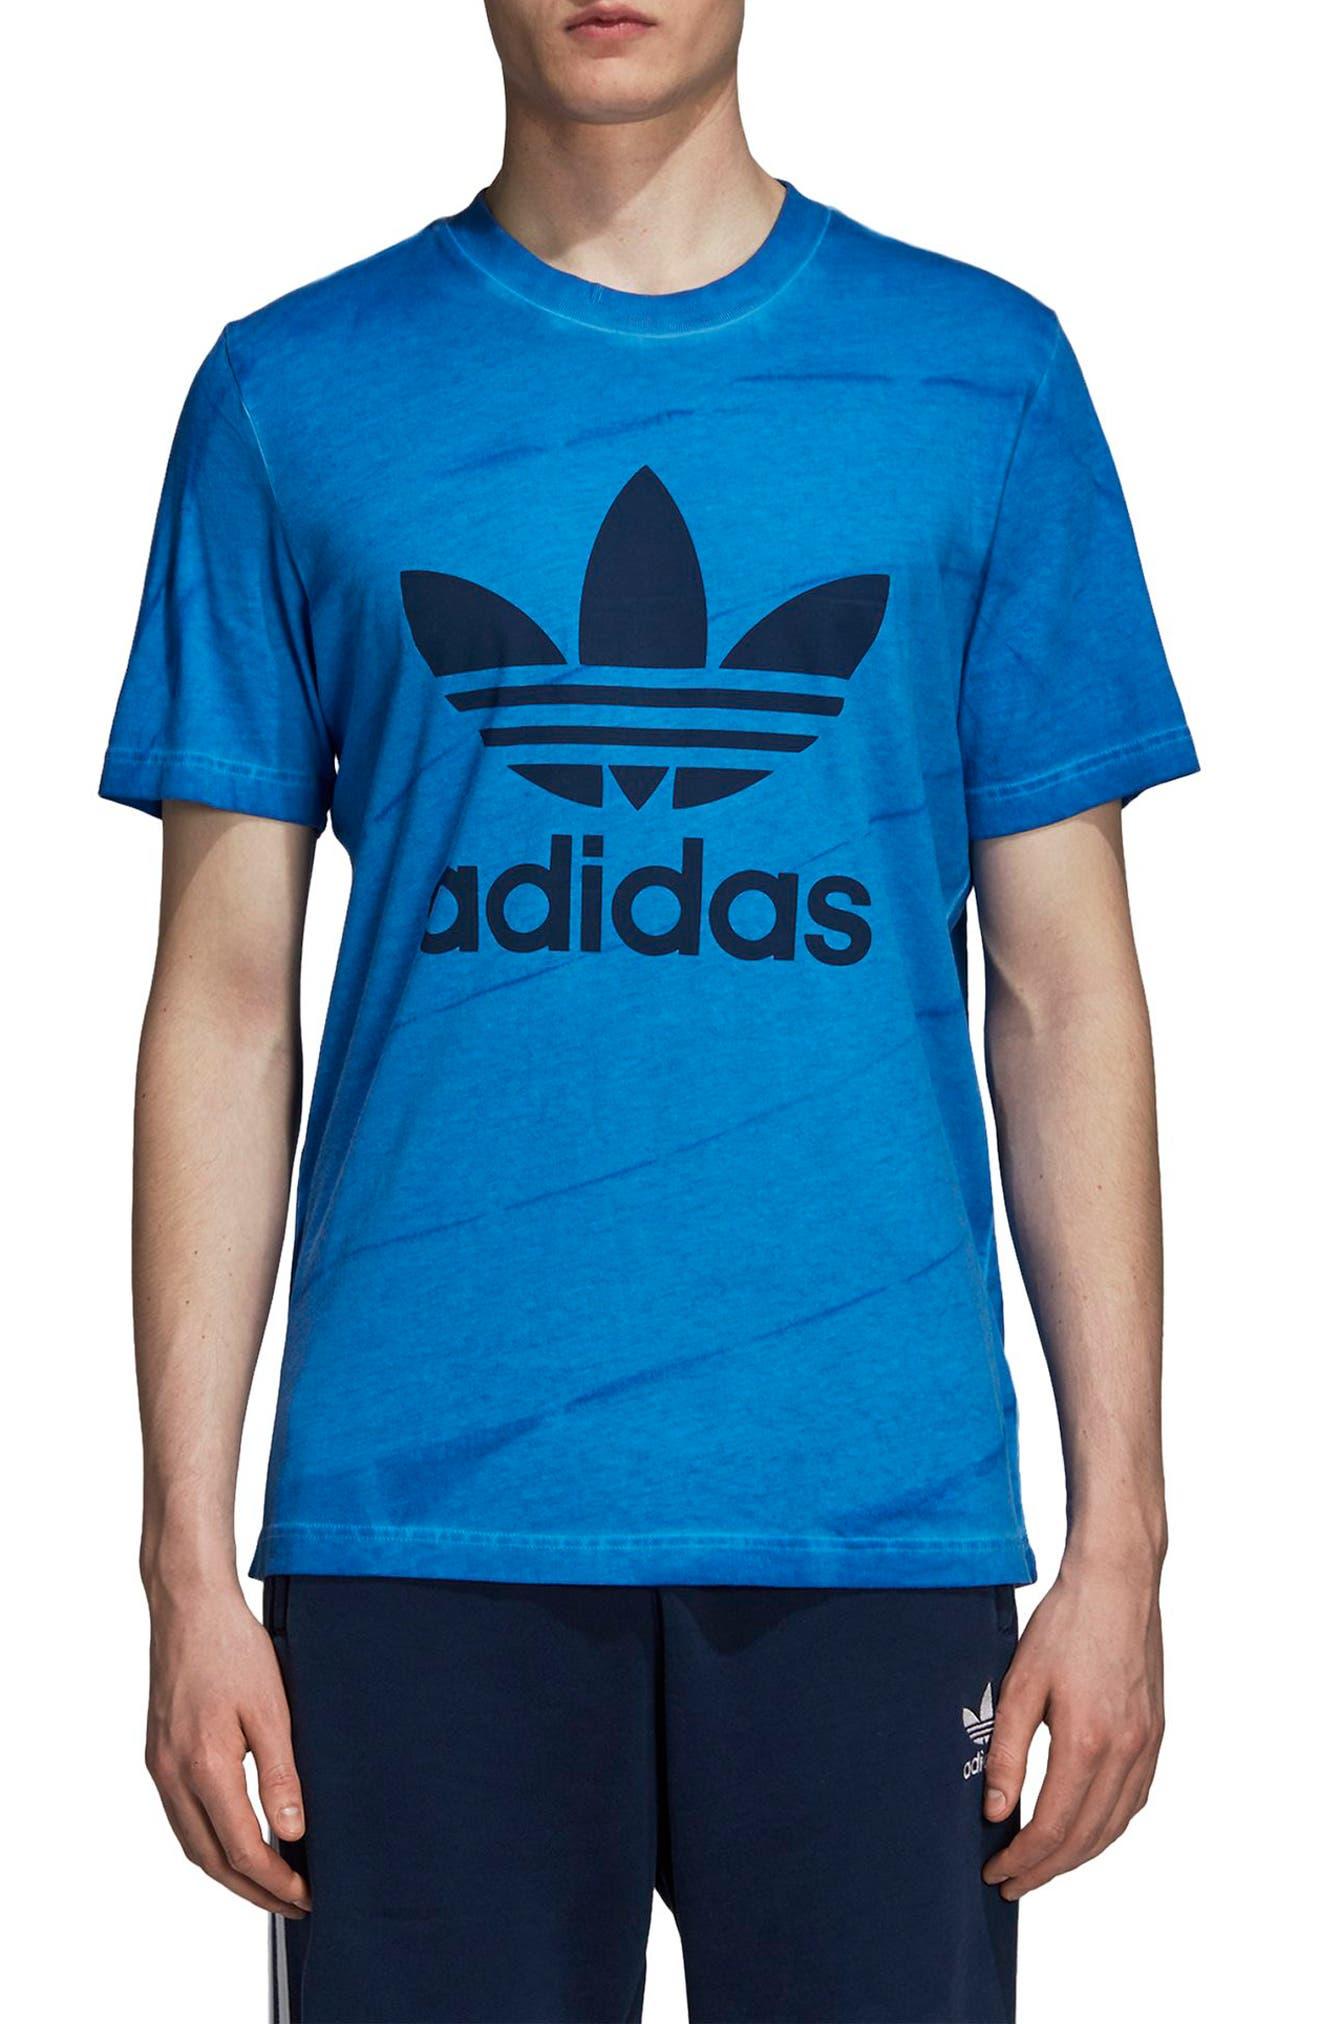 adidas Tie Dye T-Shirt,                         Main,                         color, 430